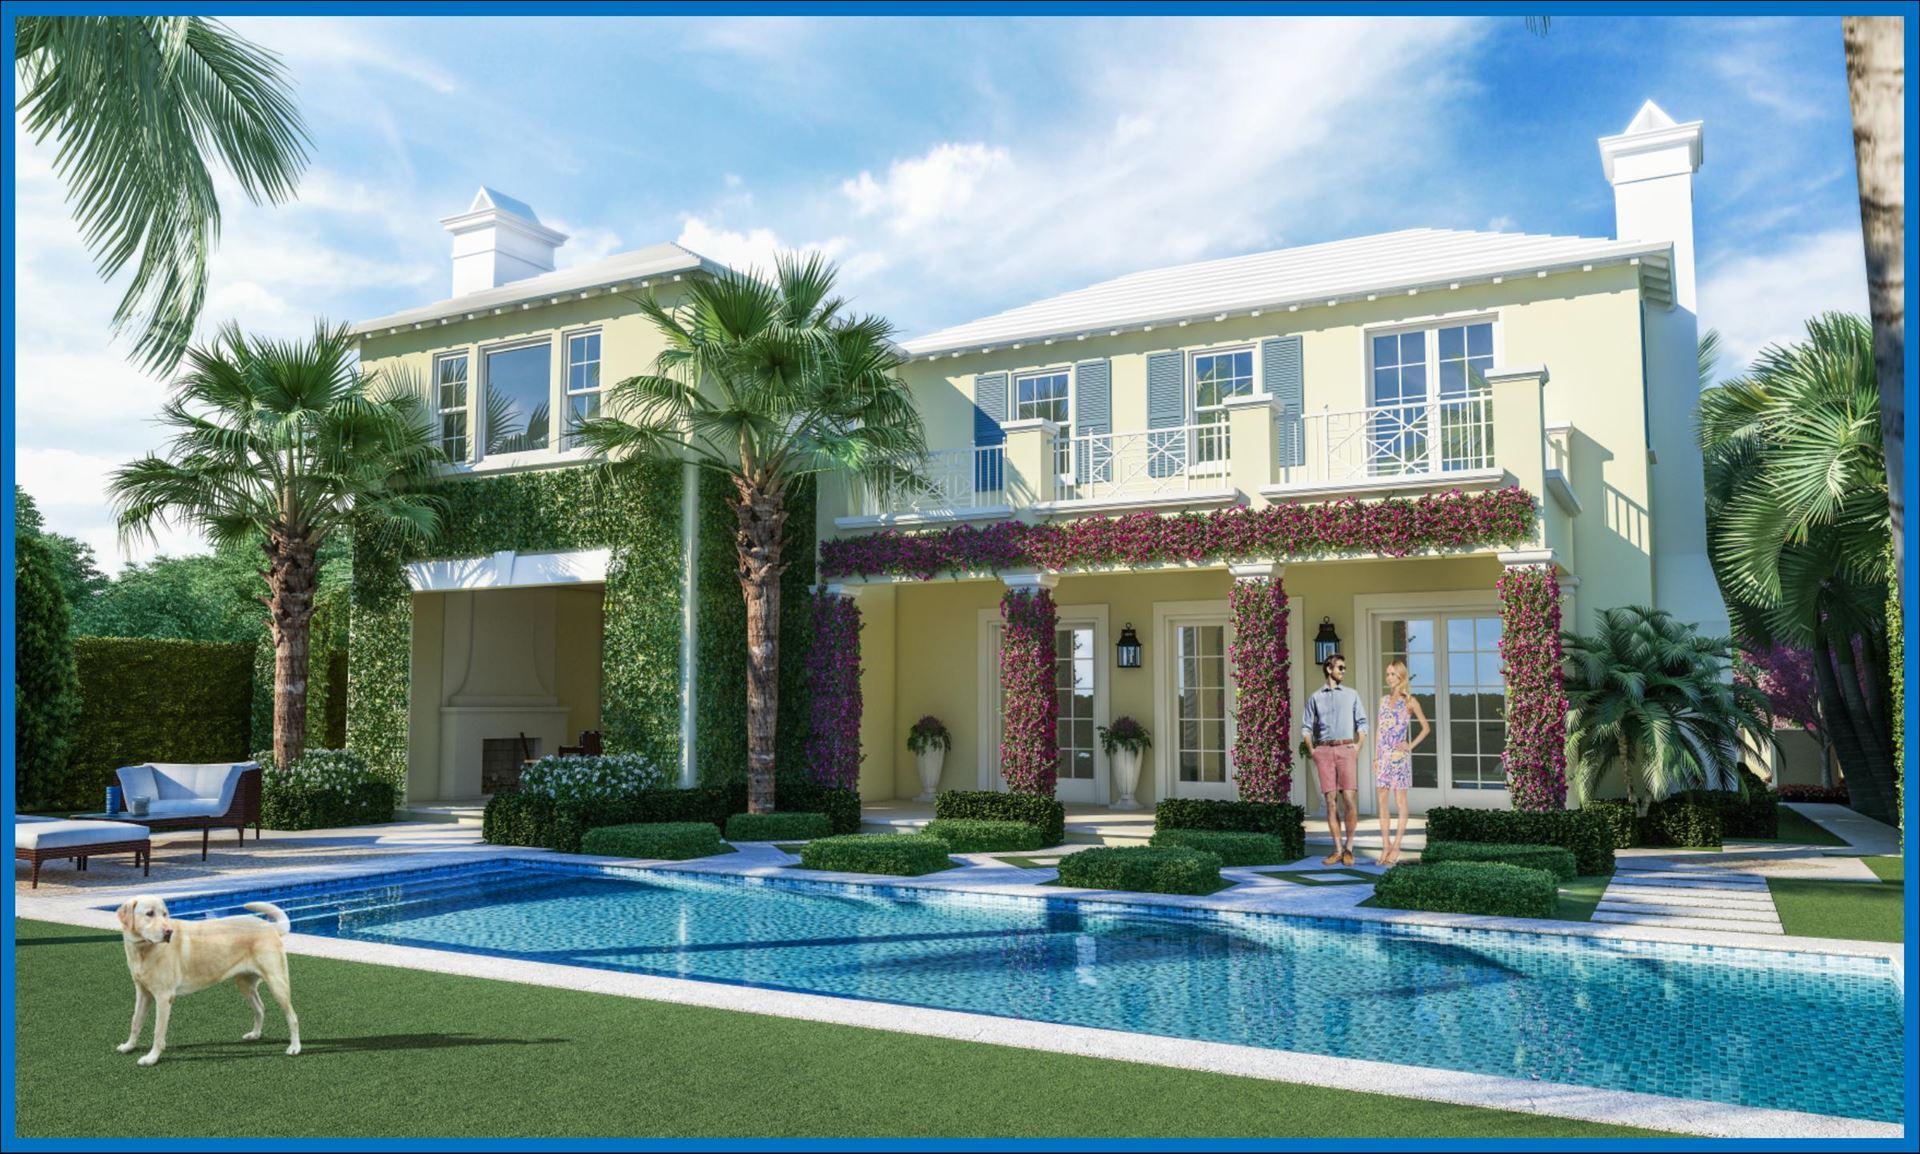 1280 N Lake Way, Palm Beach, FL 33480 - #: RX-10590566